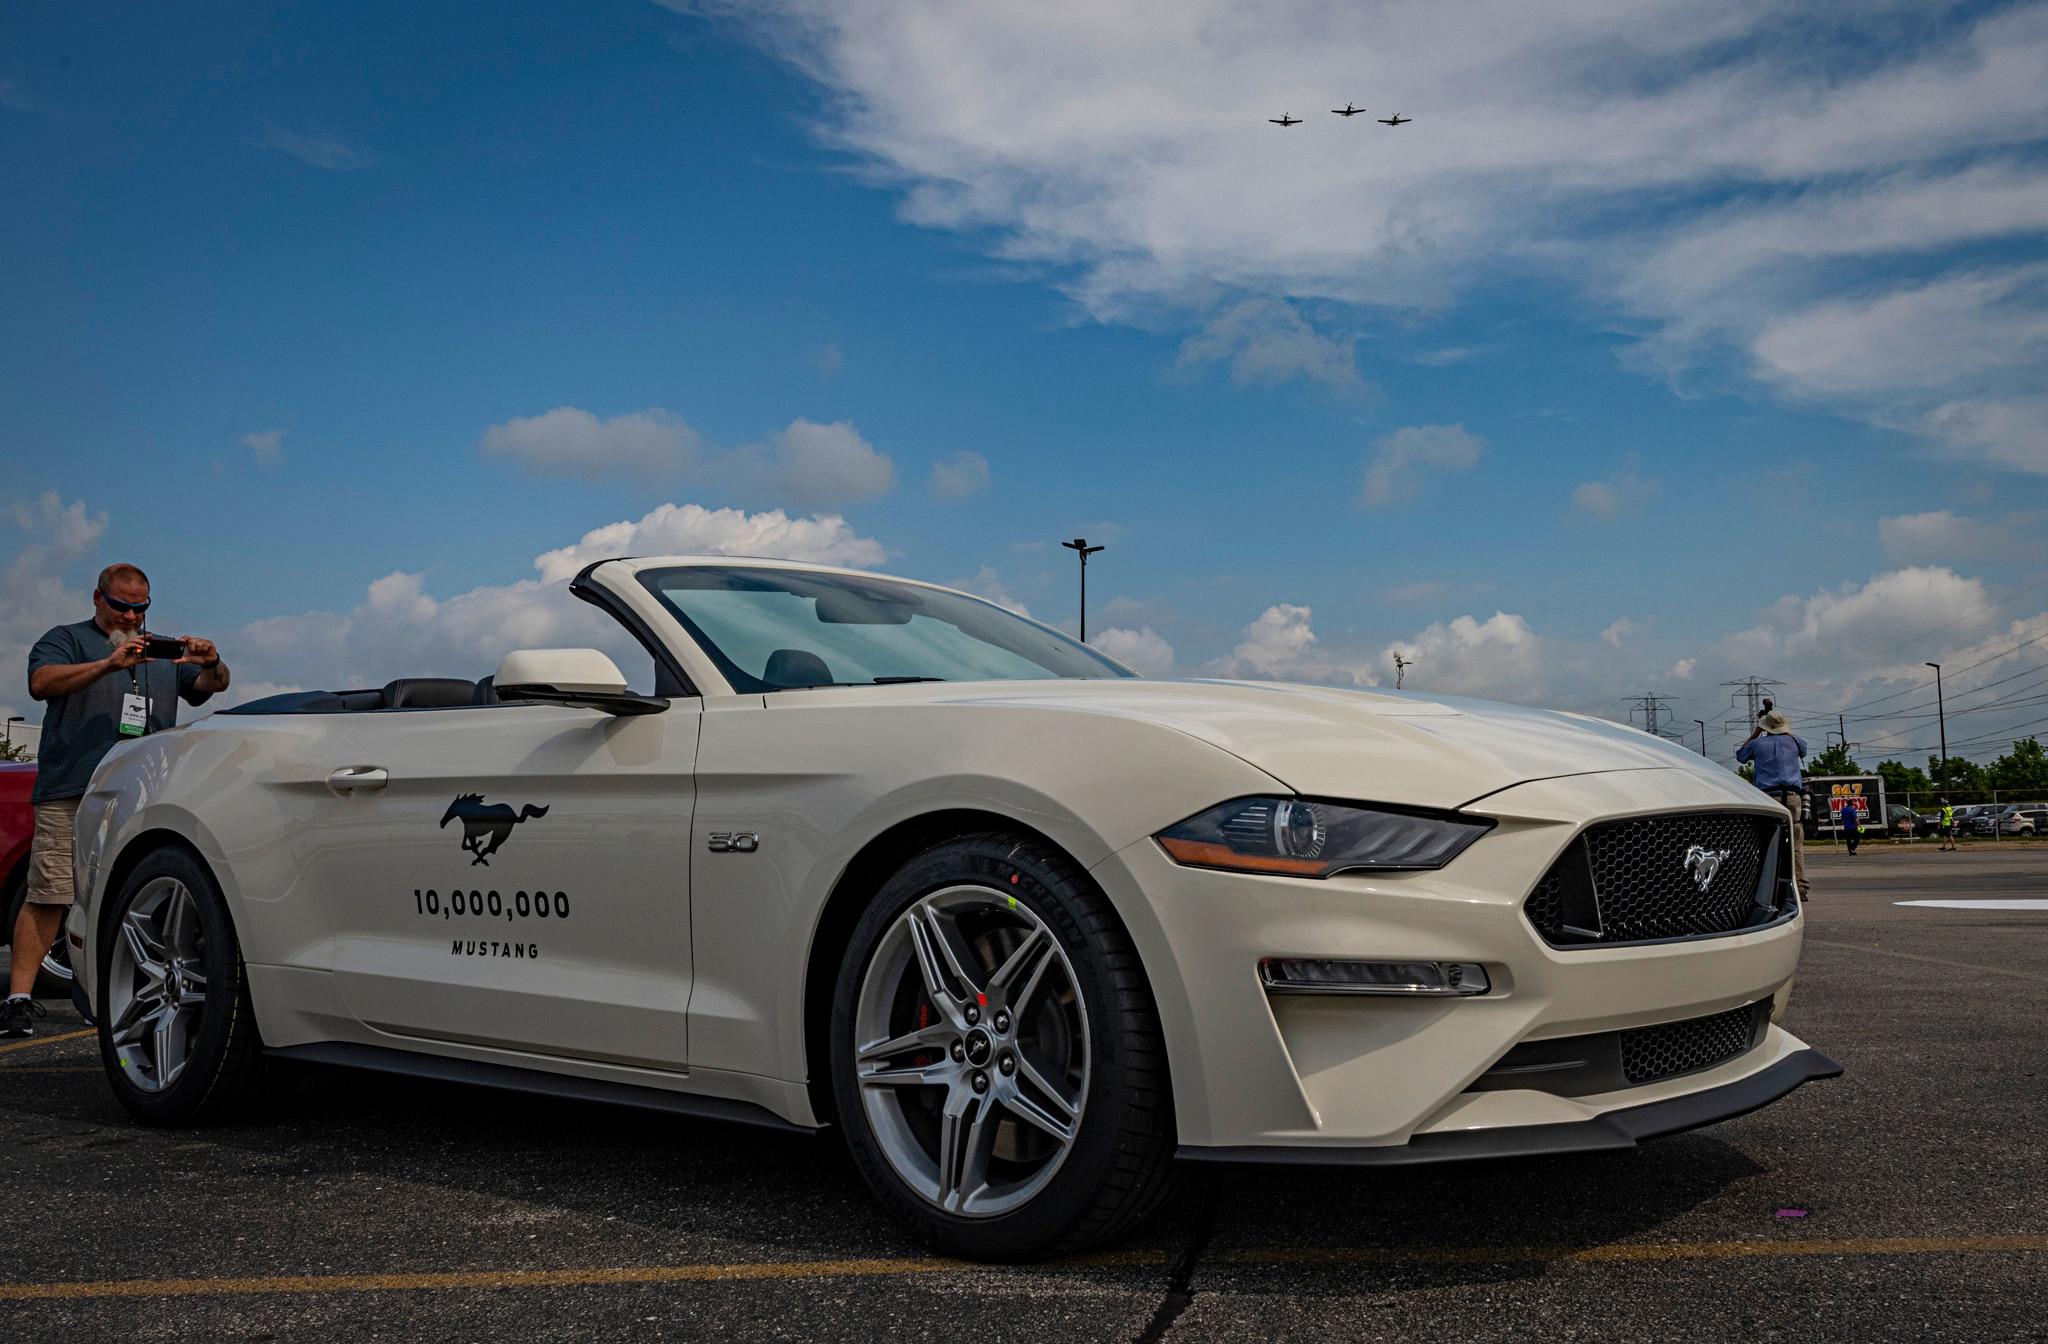 Mustang Ten Millionth 042